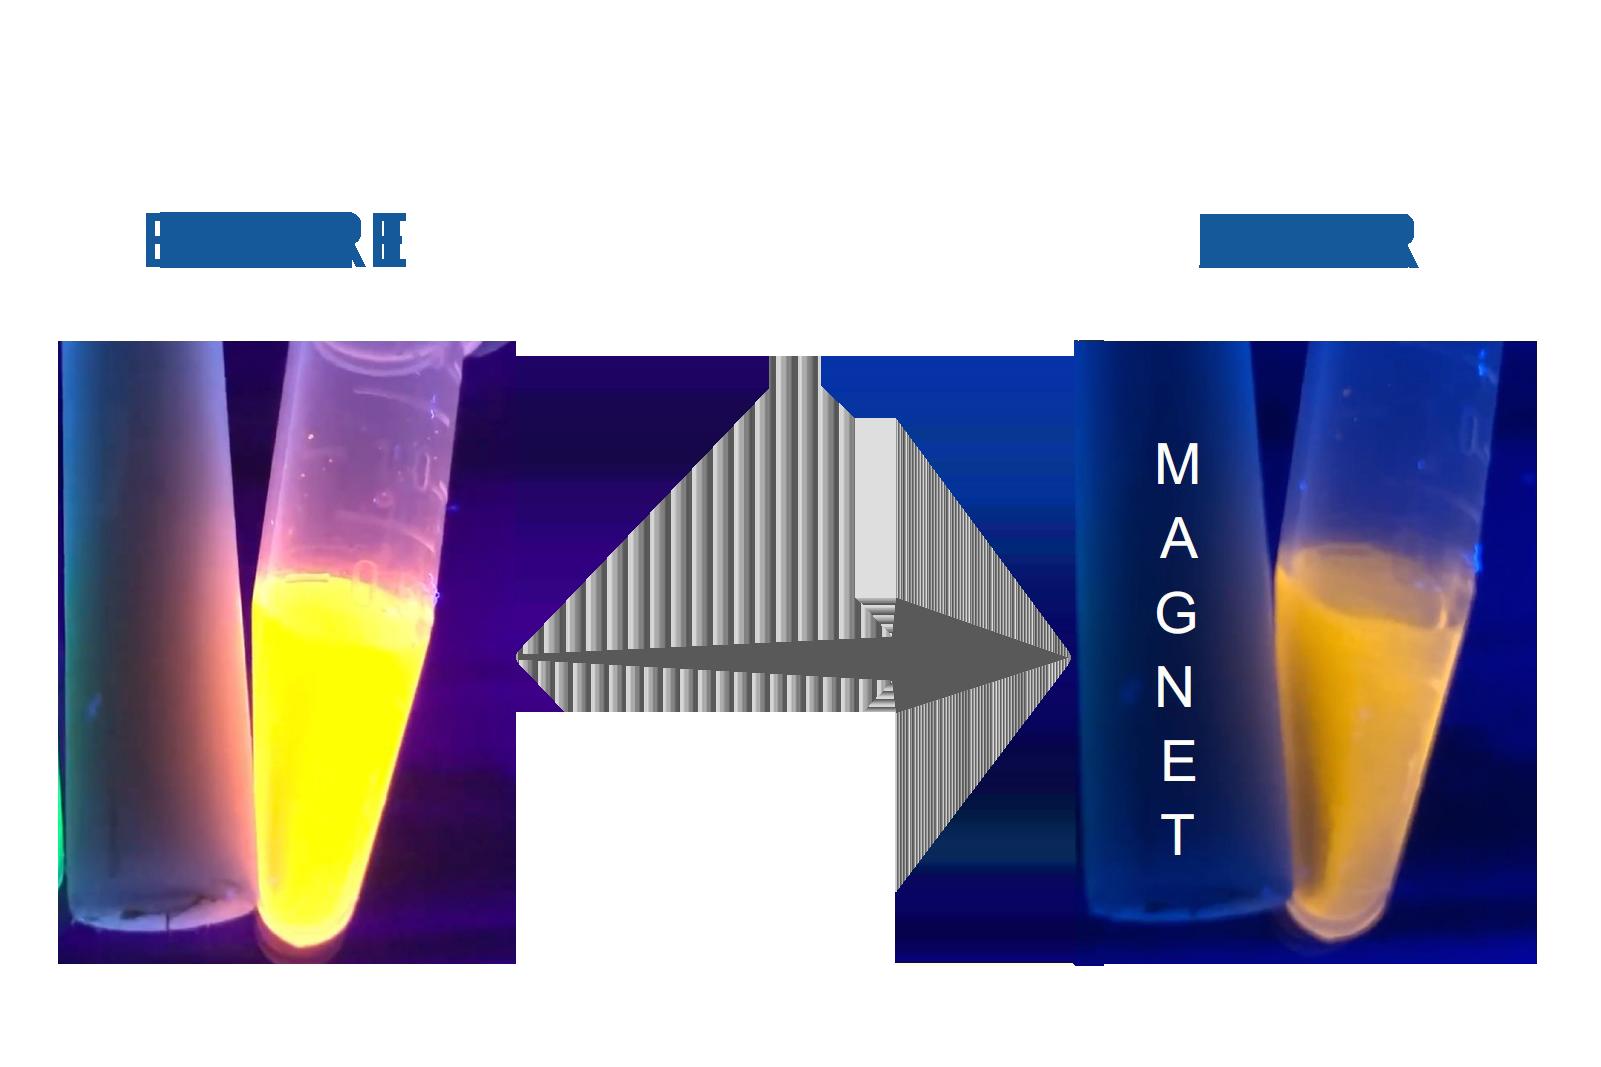 Bright Orange CdSe Based Quantum Dots (Magnetic)